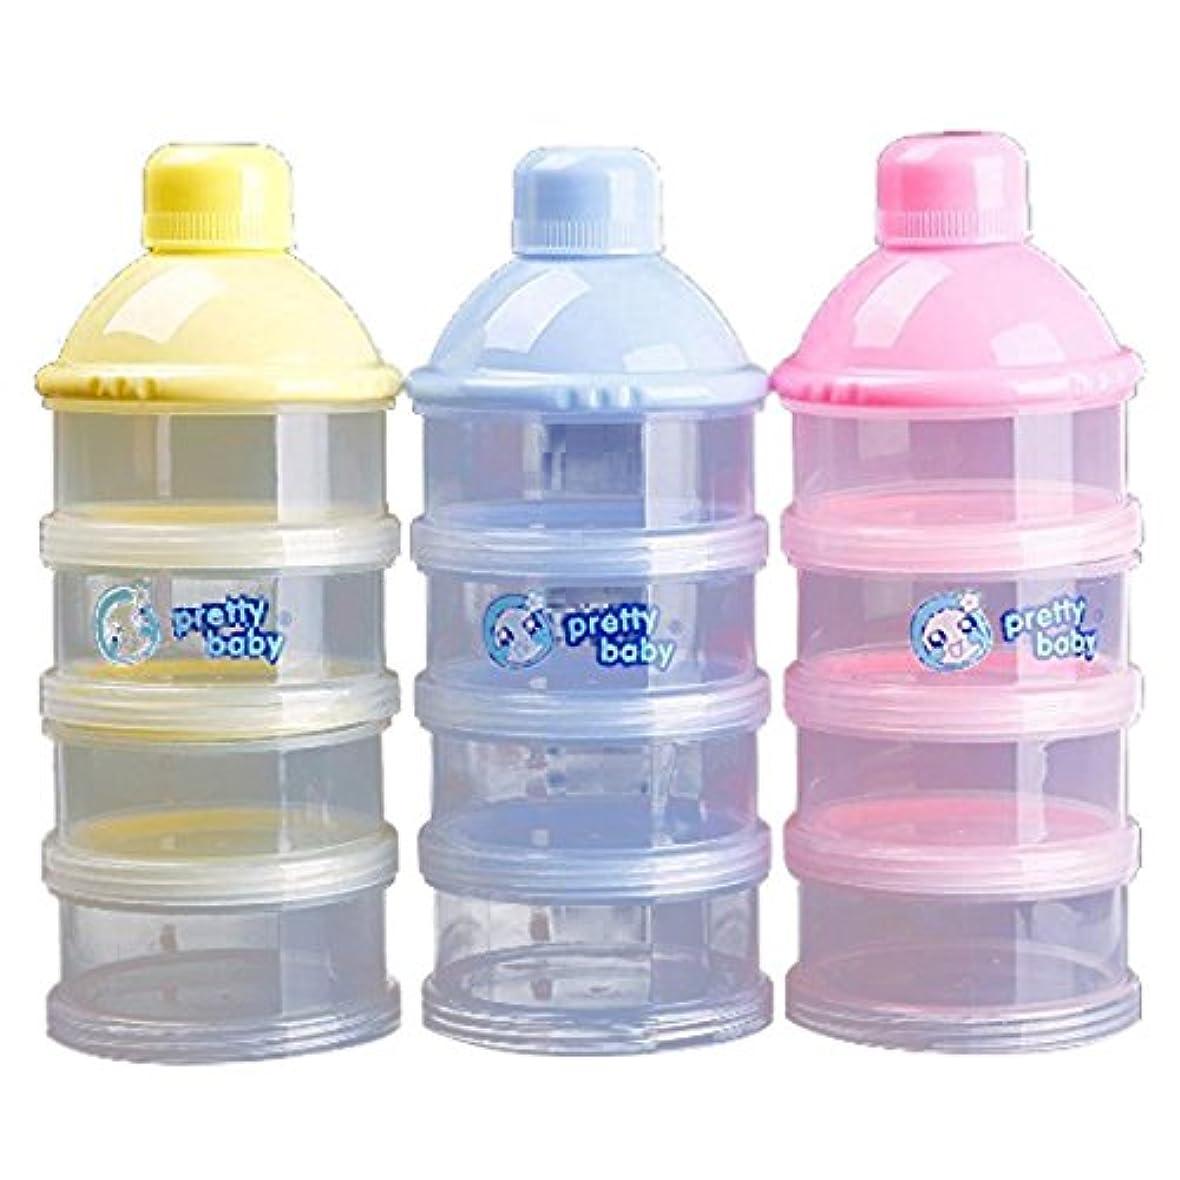 Moligh doll 1xポータブルベビー乳児ミルクパウダー&フードボトルコンテナ4セルグリッドボックス、ランダムな色